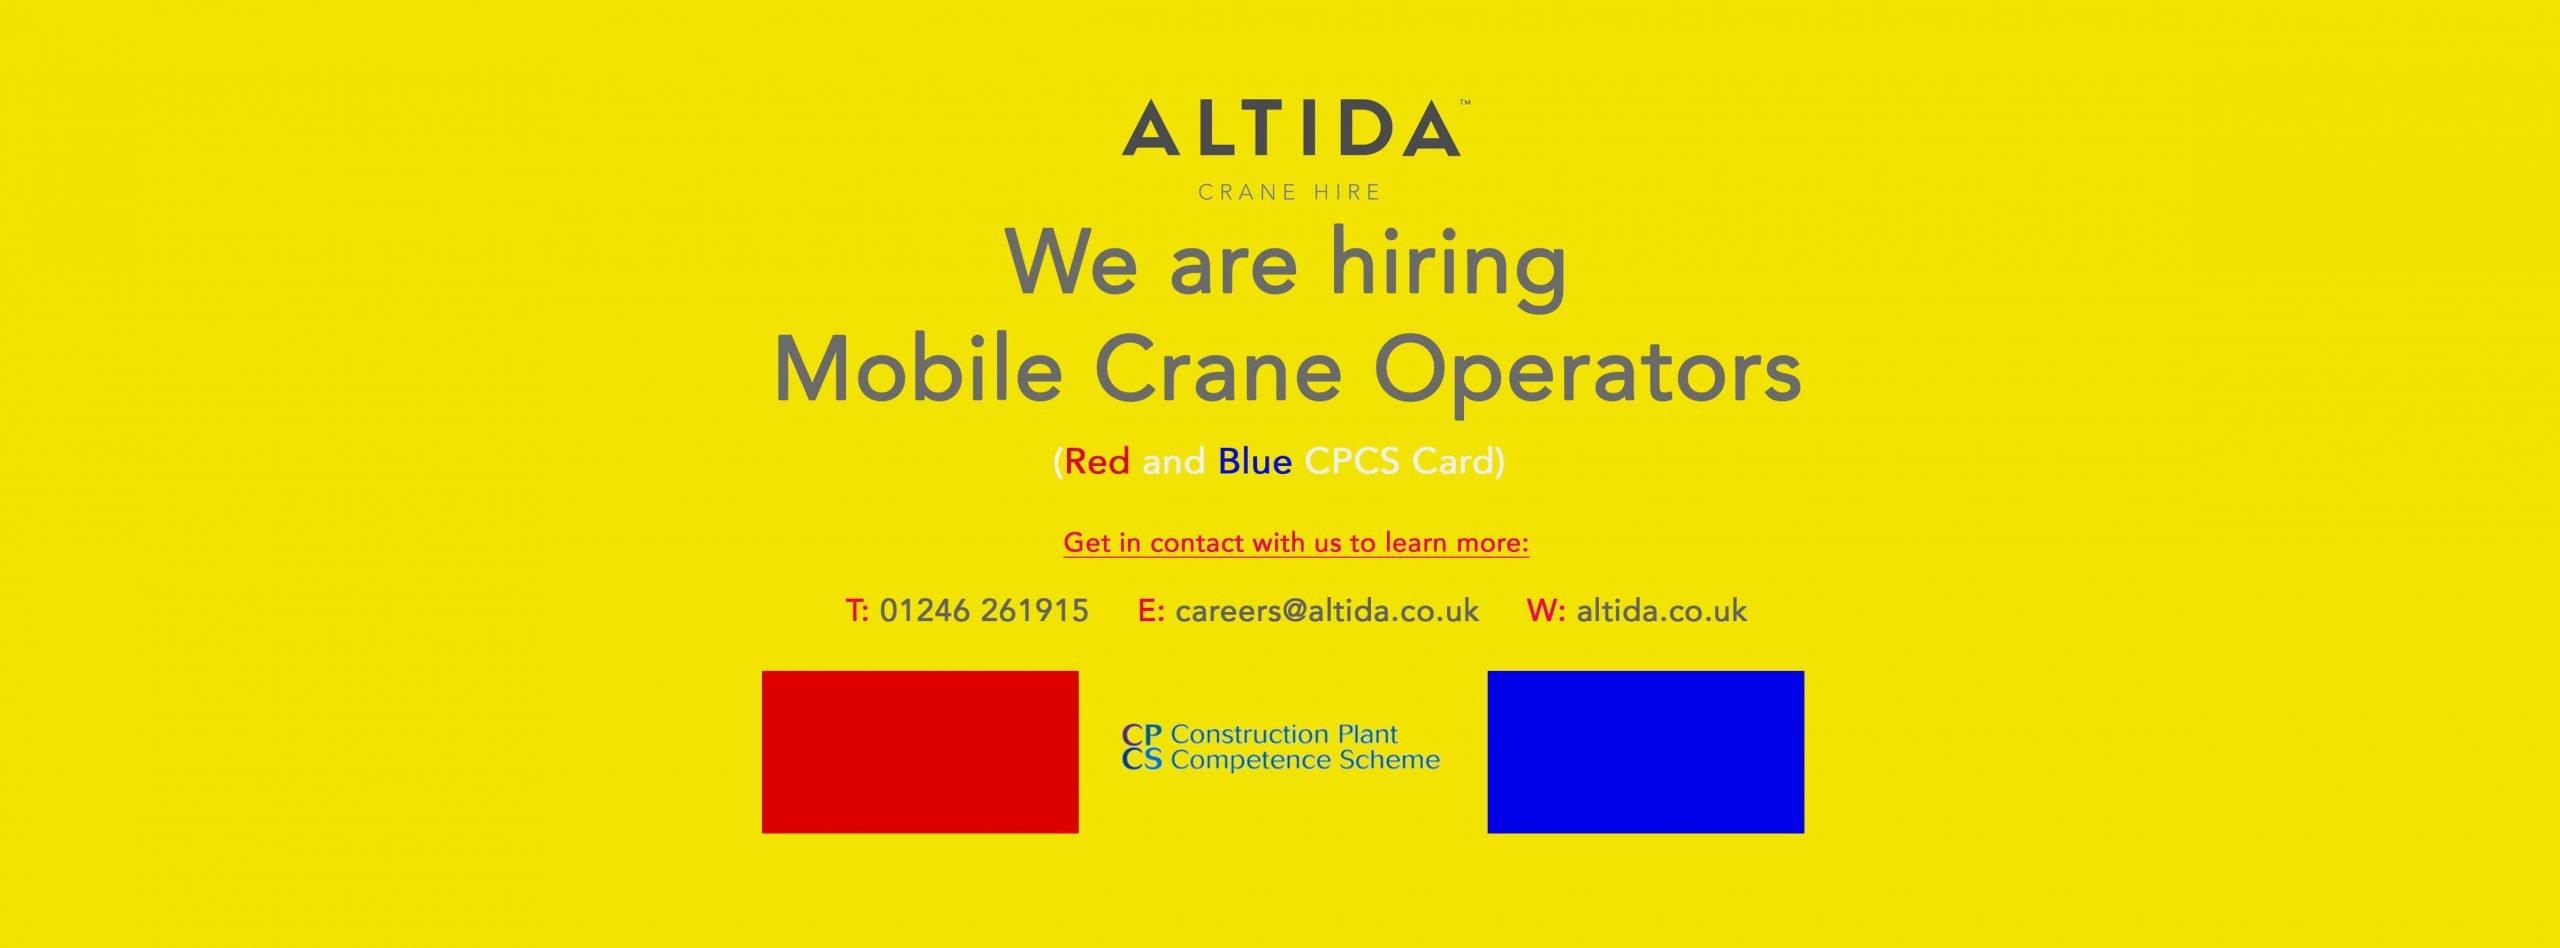 Resized Mobile Crane Operator Advert scaled